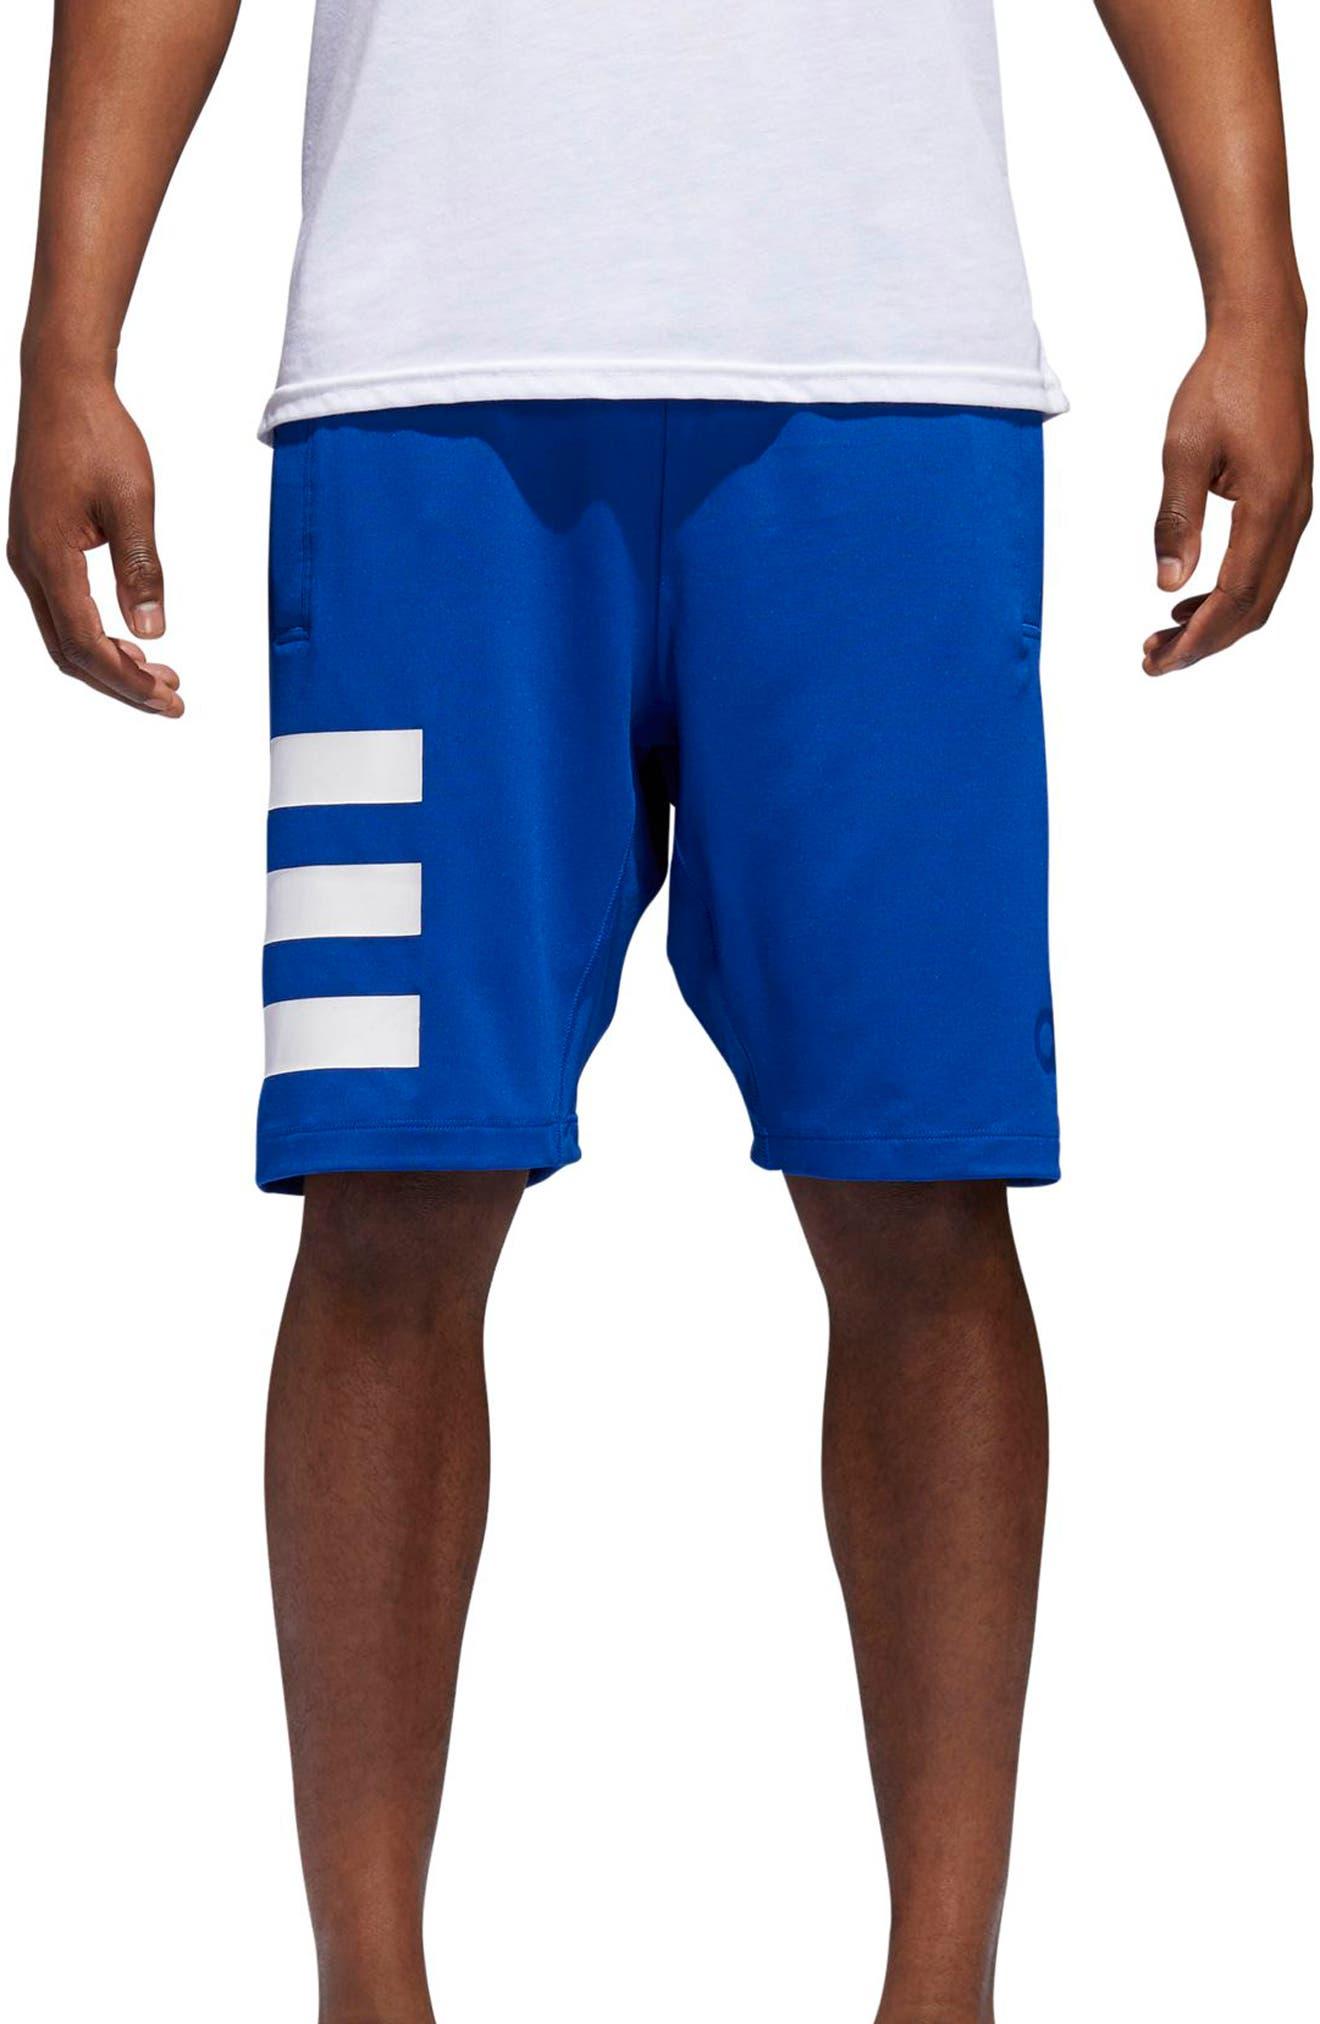 SB Hype Icon Shorts,                         Main,                         color, Collegiate Royal / White